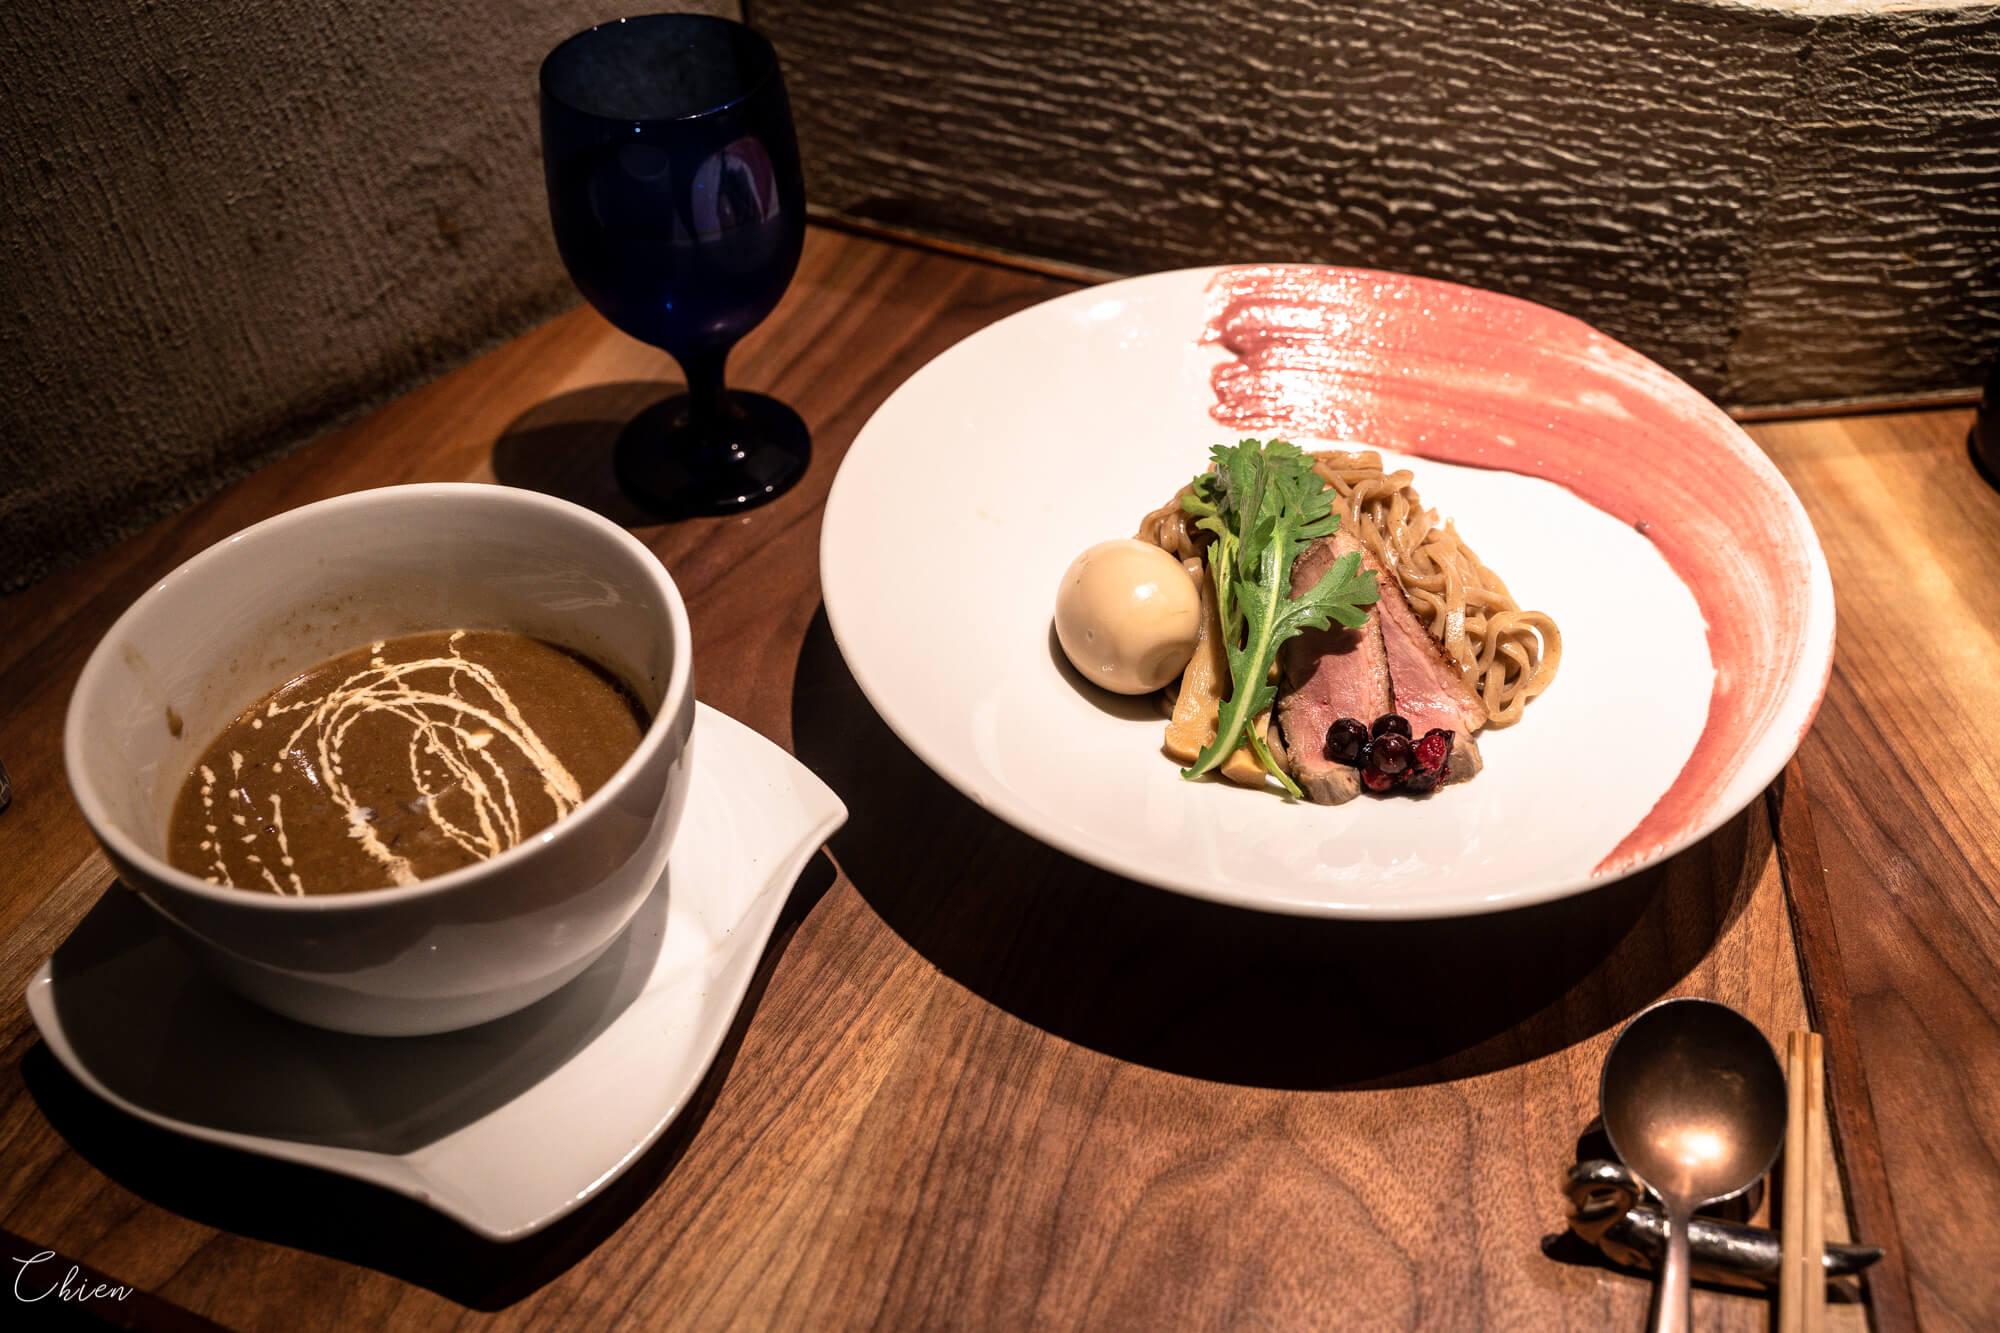 京都祇園鴨肉沾麵 Gion Duck Noodles🦆🍜